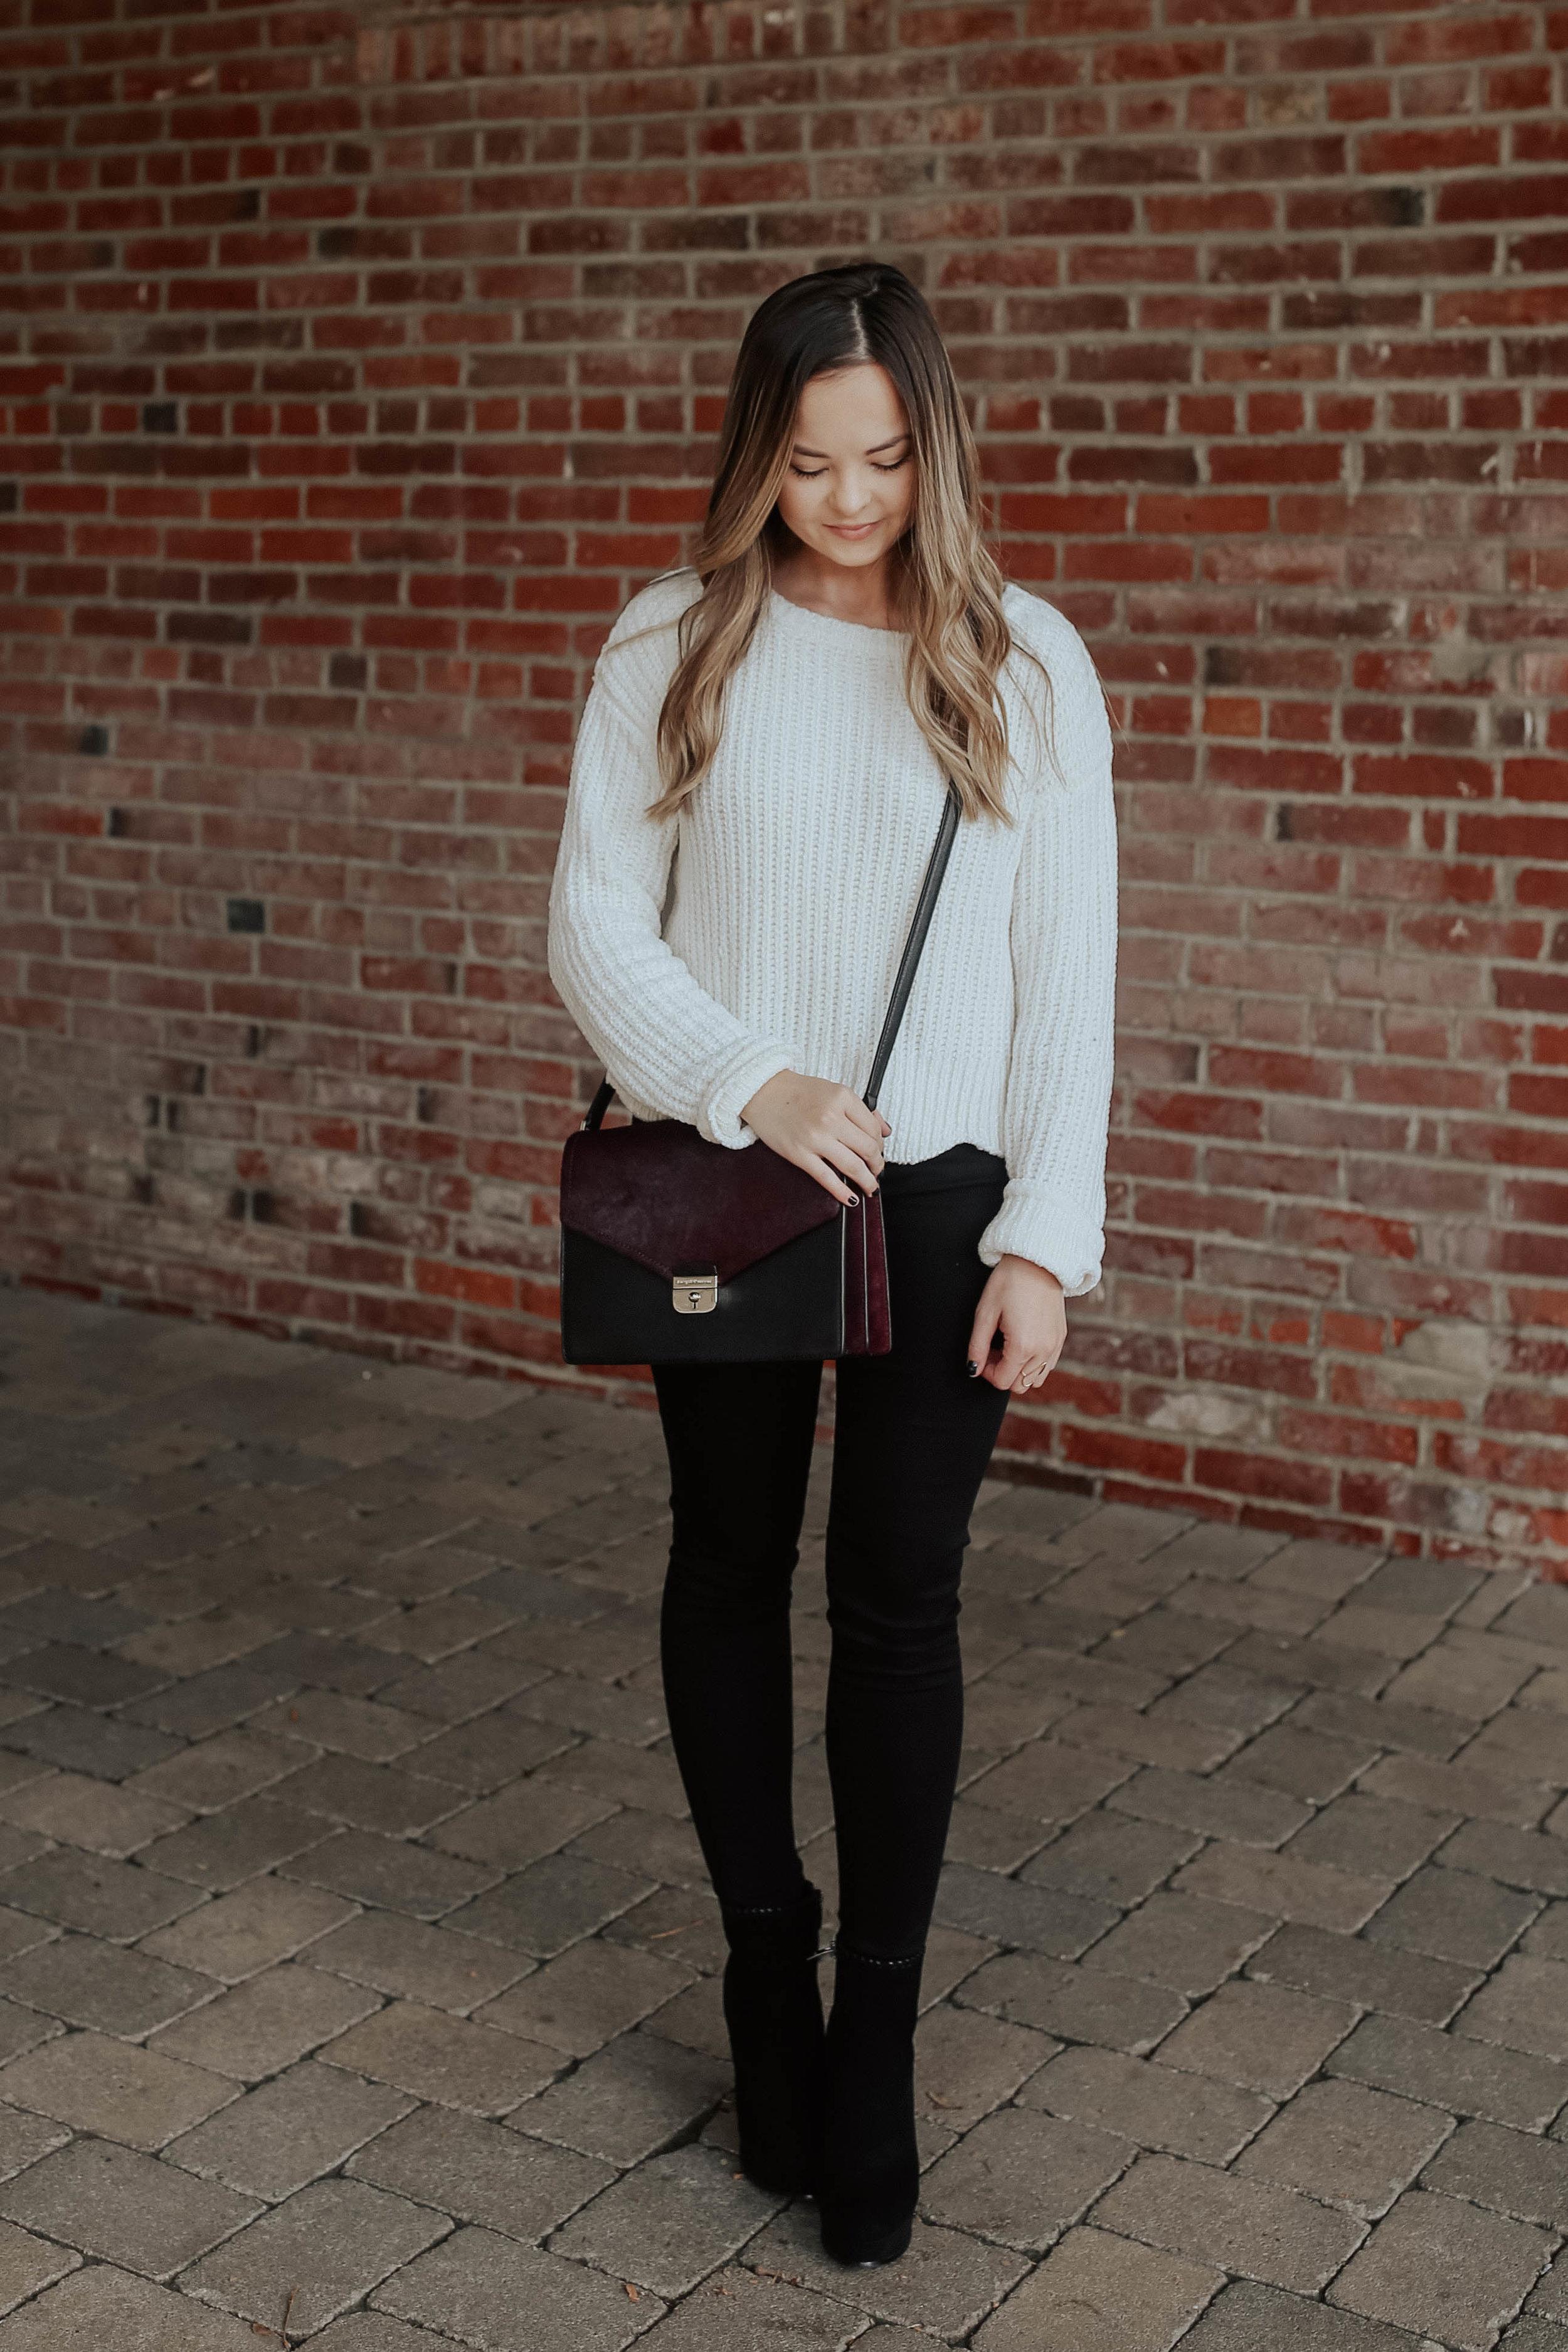 shop this look: - sweatersimilar bagsimilar ringsimilar shoes - here and here